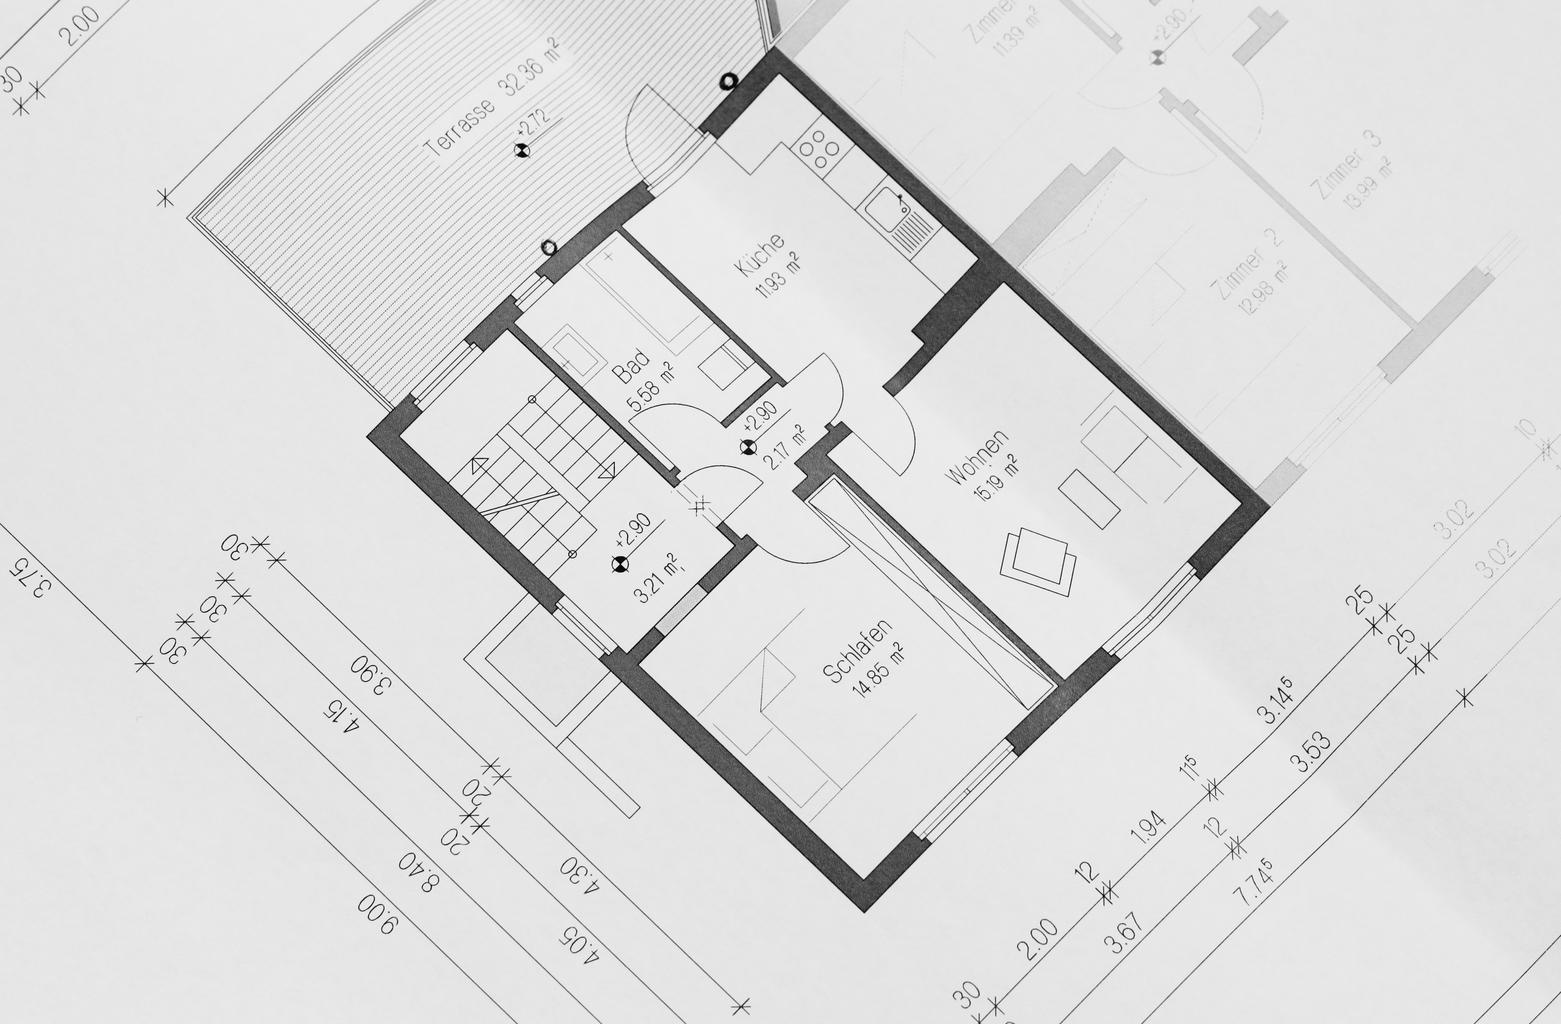 plán architektúry